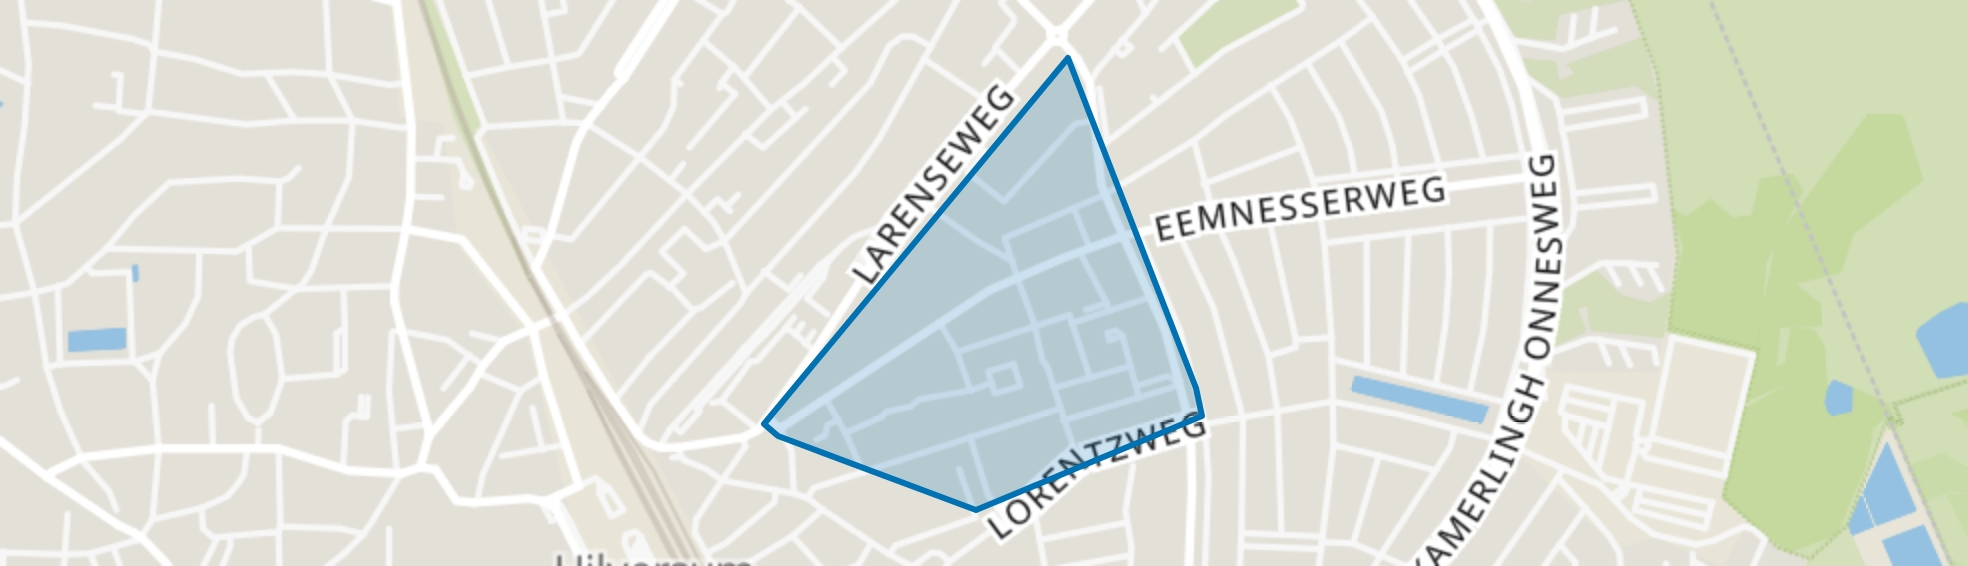 Electrobuurt, Hilversum map